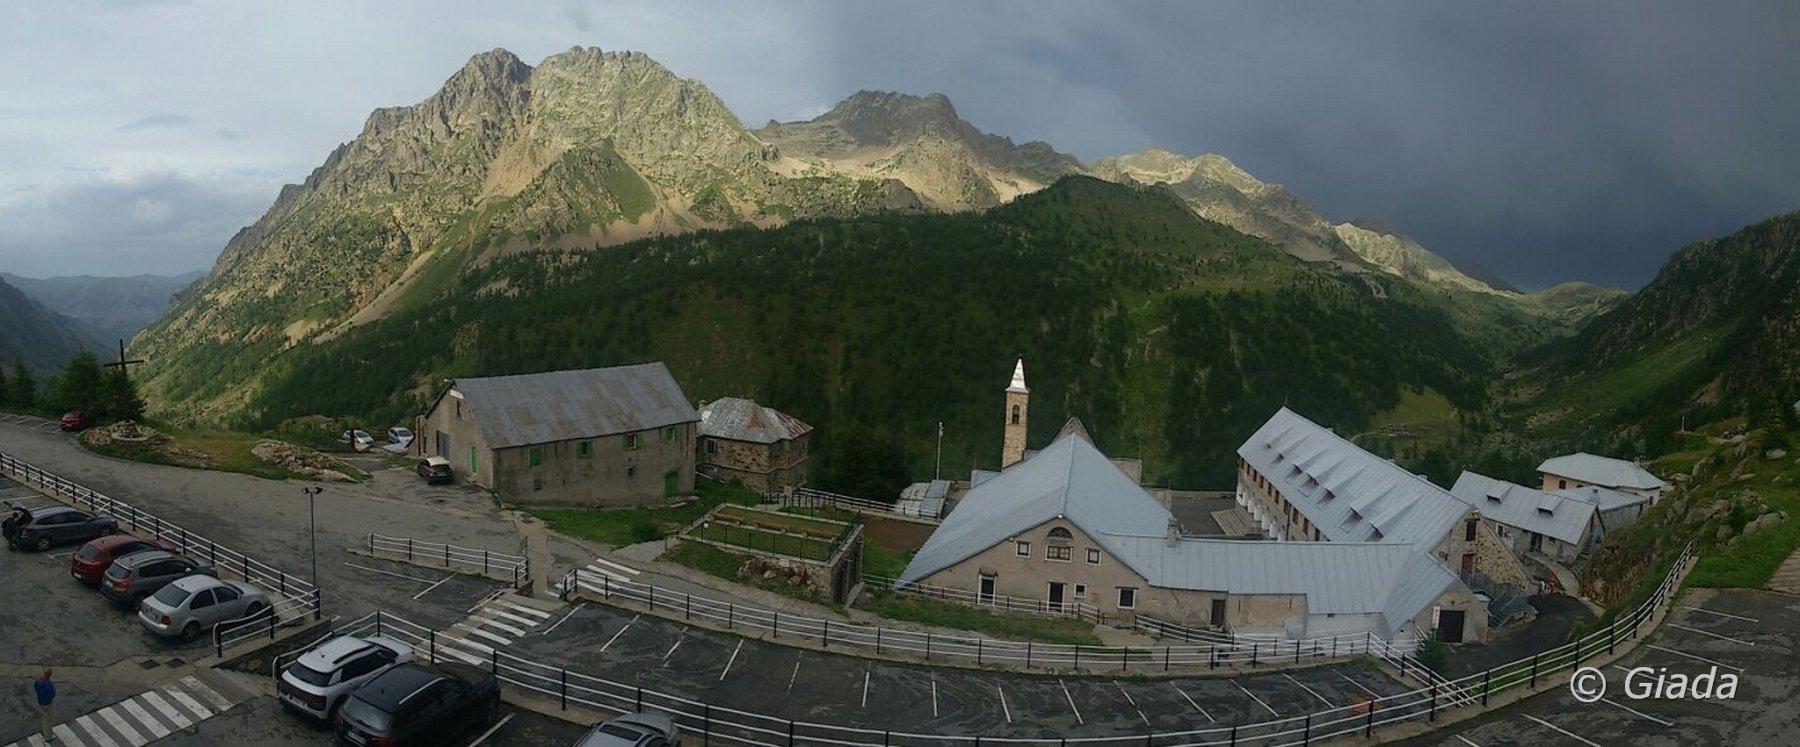 Santuario di Sant'Anna di Vinadio